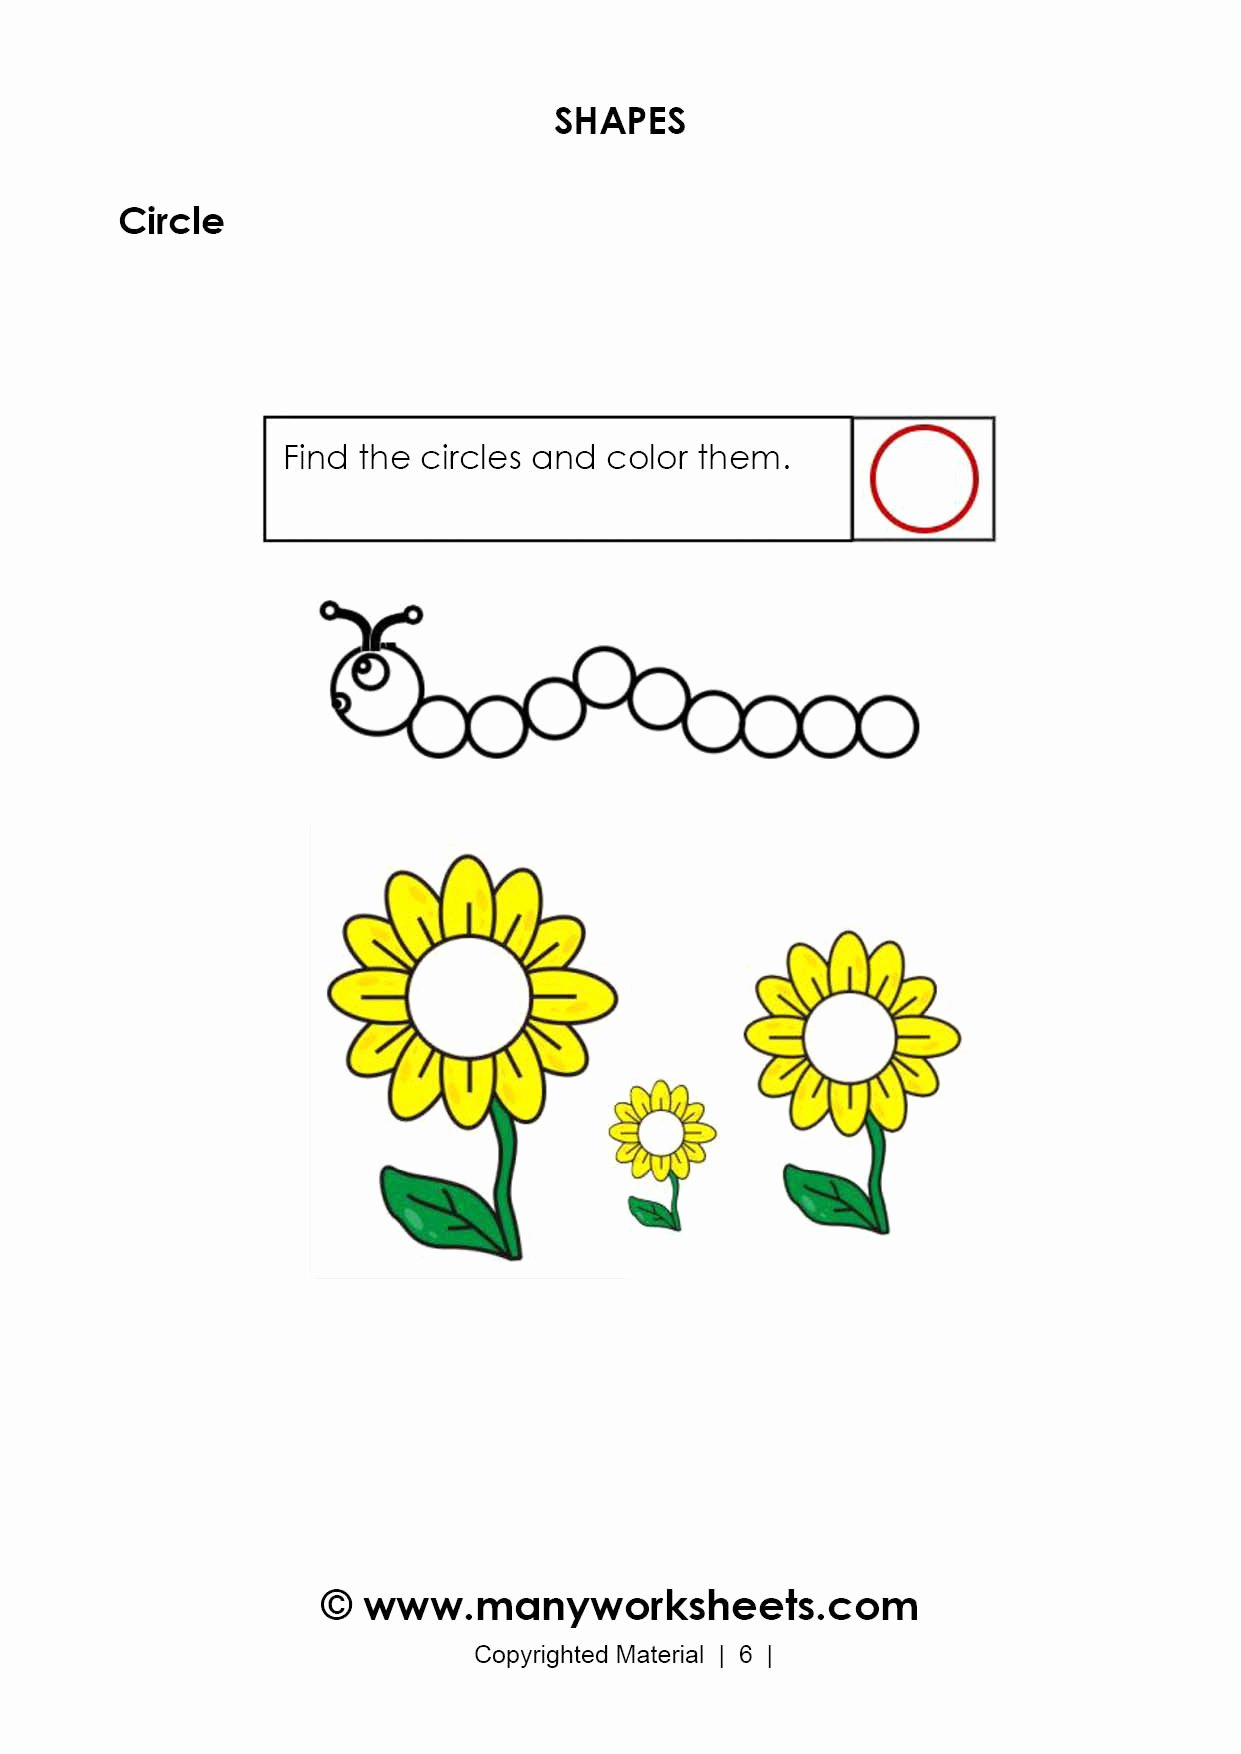 Circle Shape Worksheets for Preschoolers top Recognizing Circle Shape Worksheet